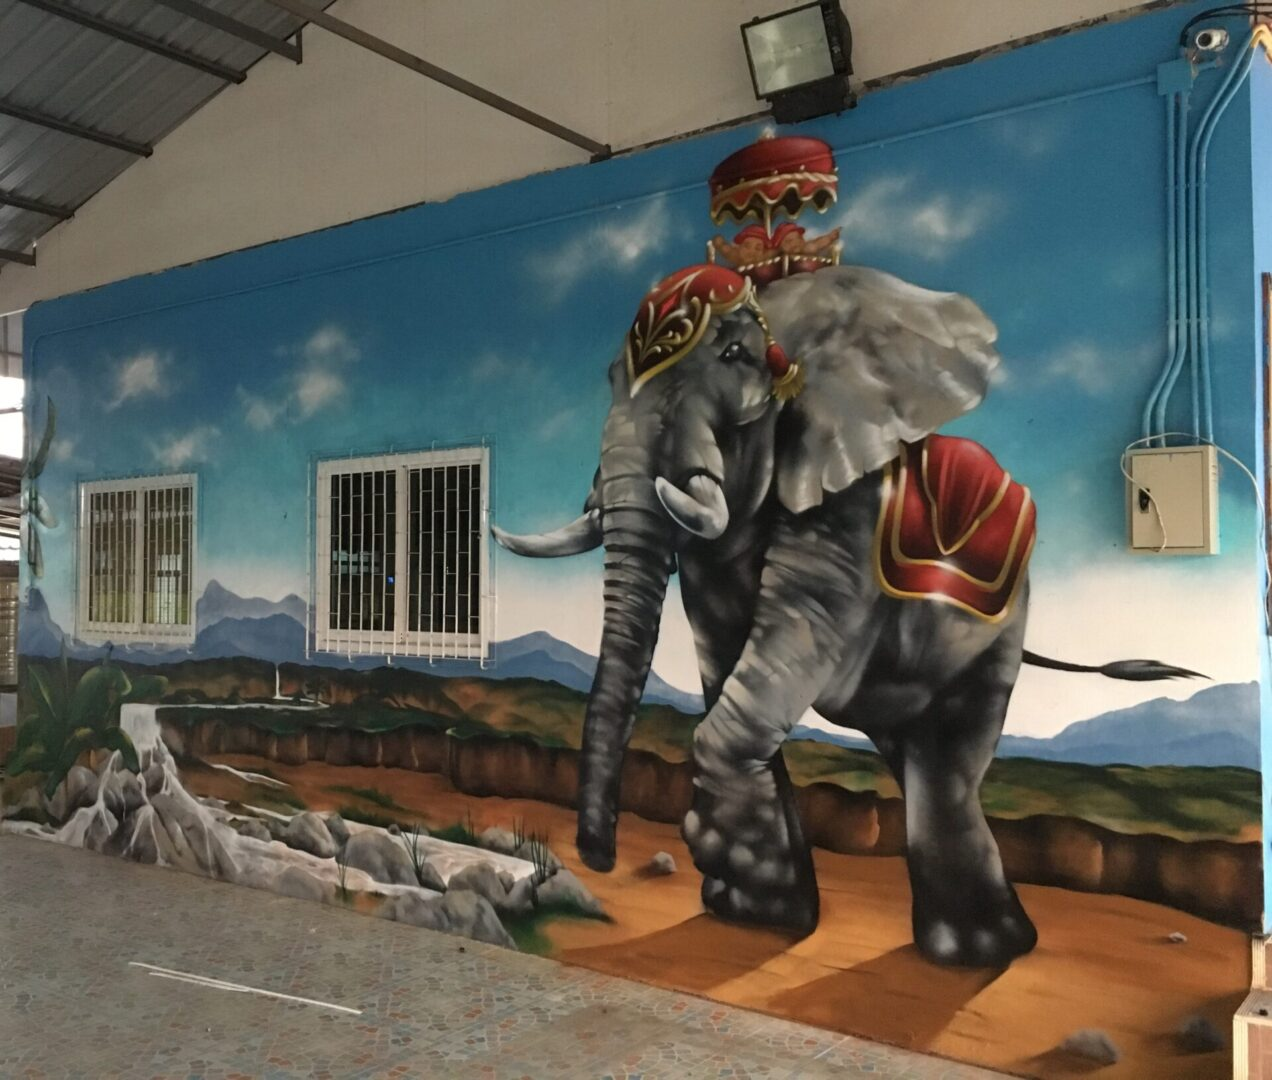 Mural of a royal elephant